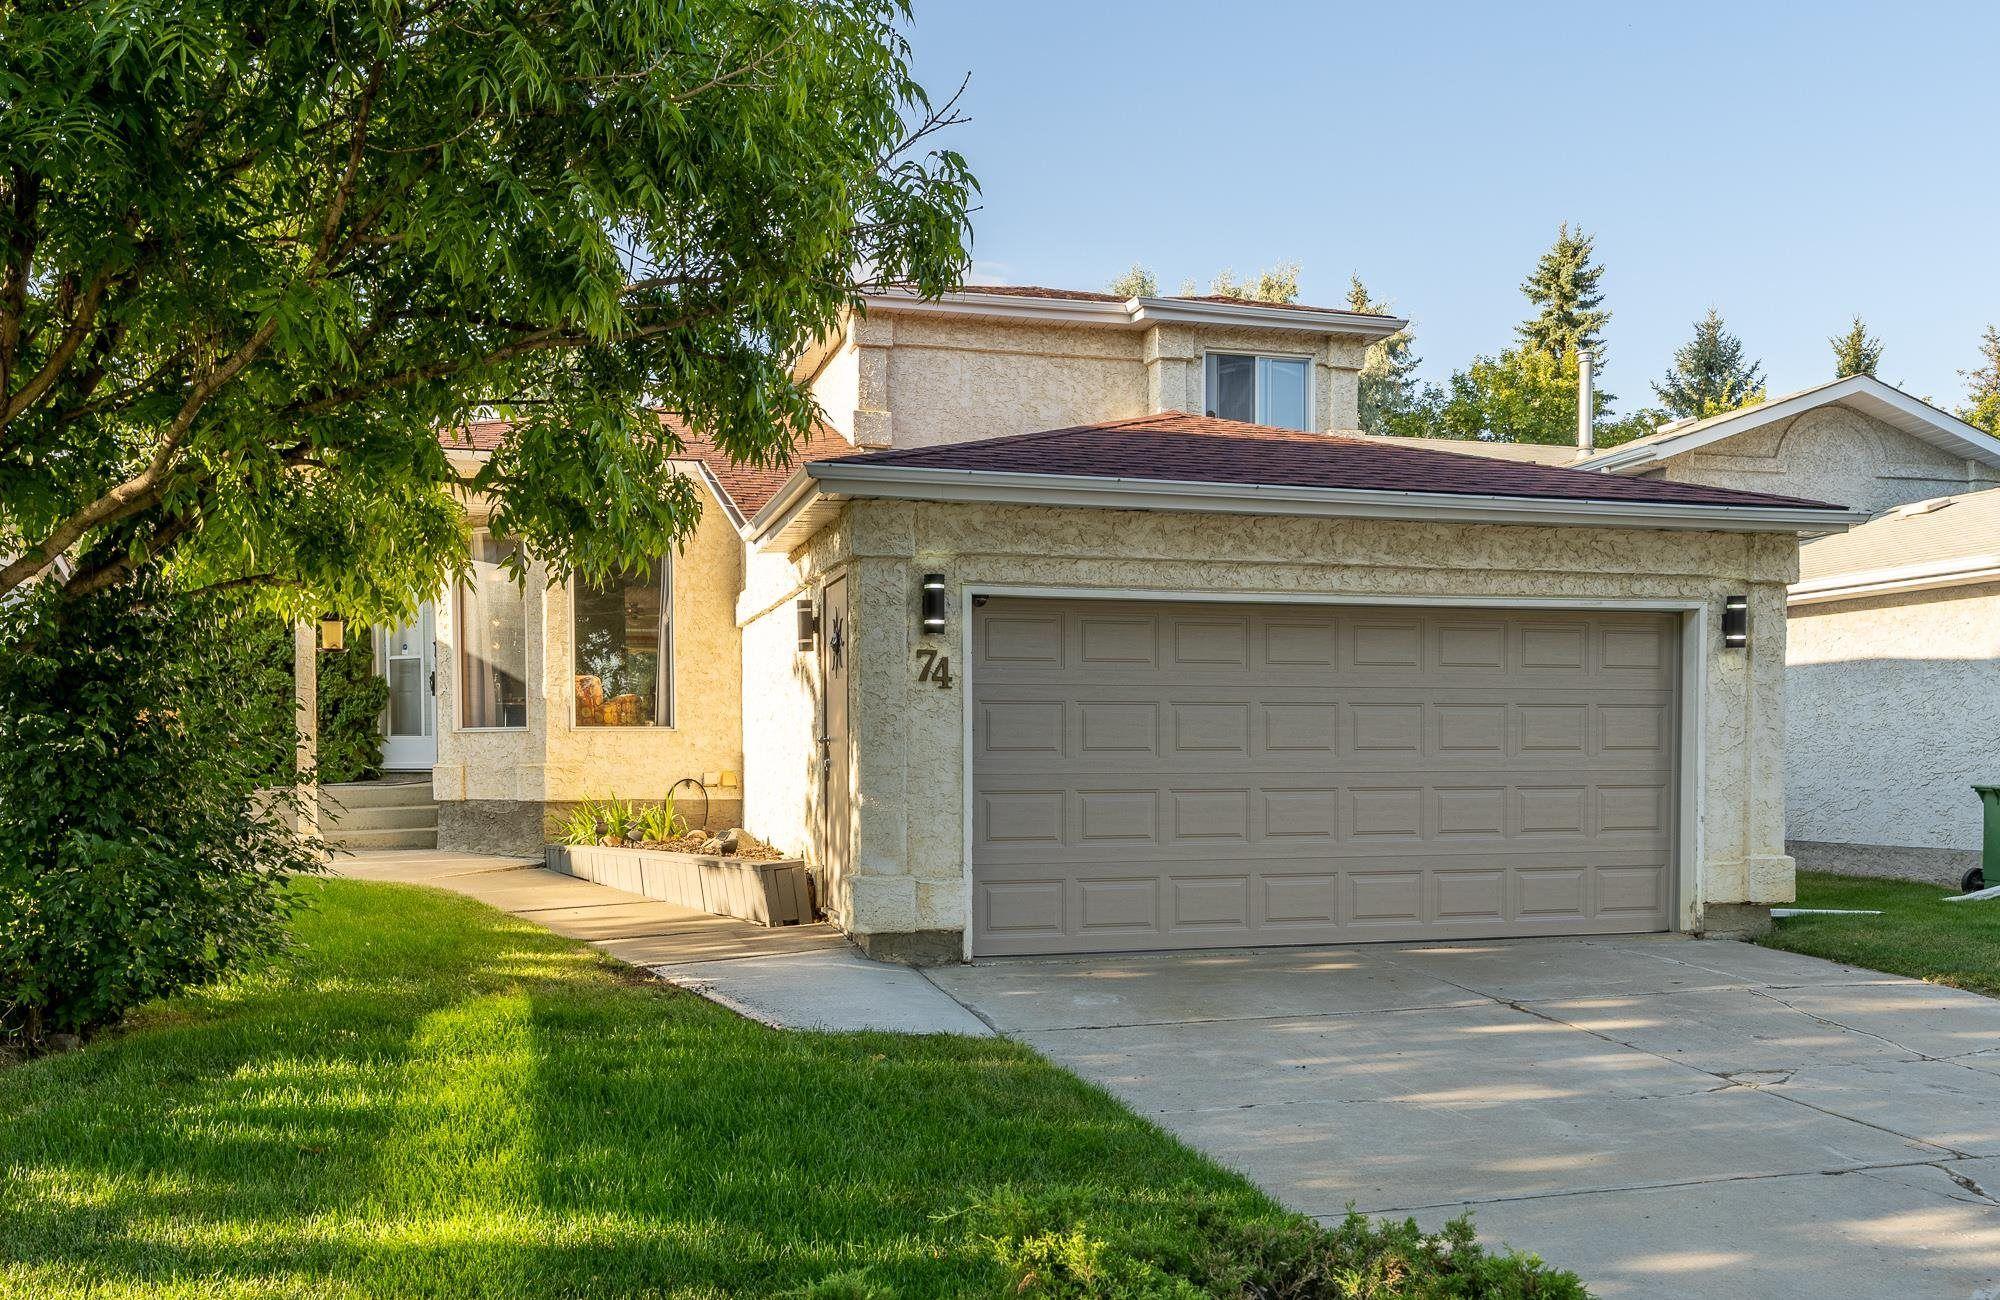 Main Photo: 74 DEERBOURNE Drive: St. Albert House for sale : MLS®# E4259846